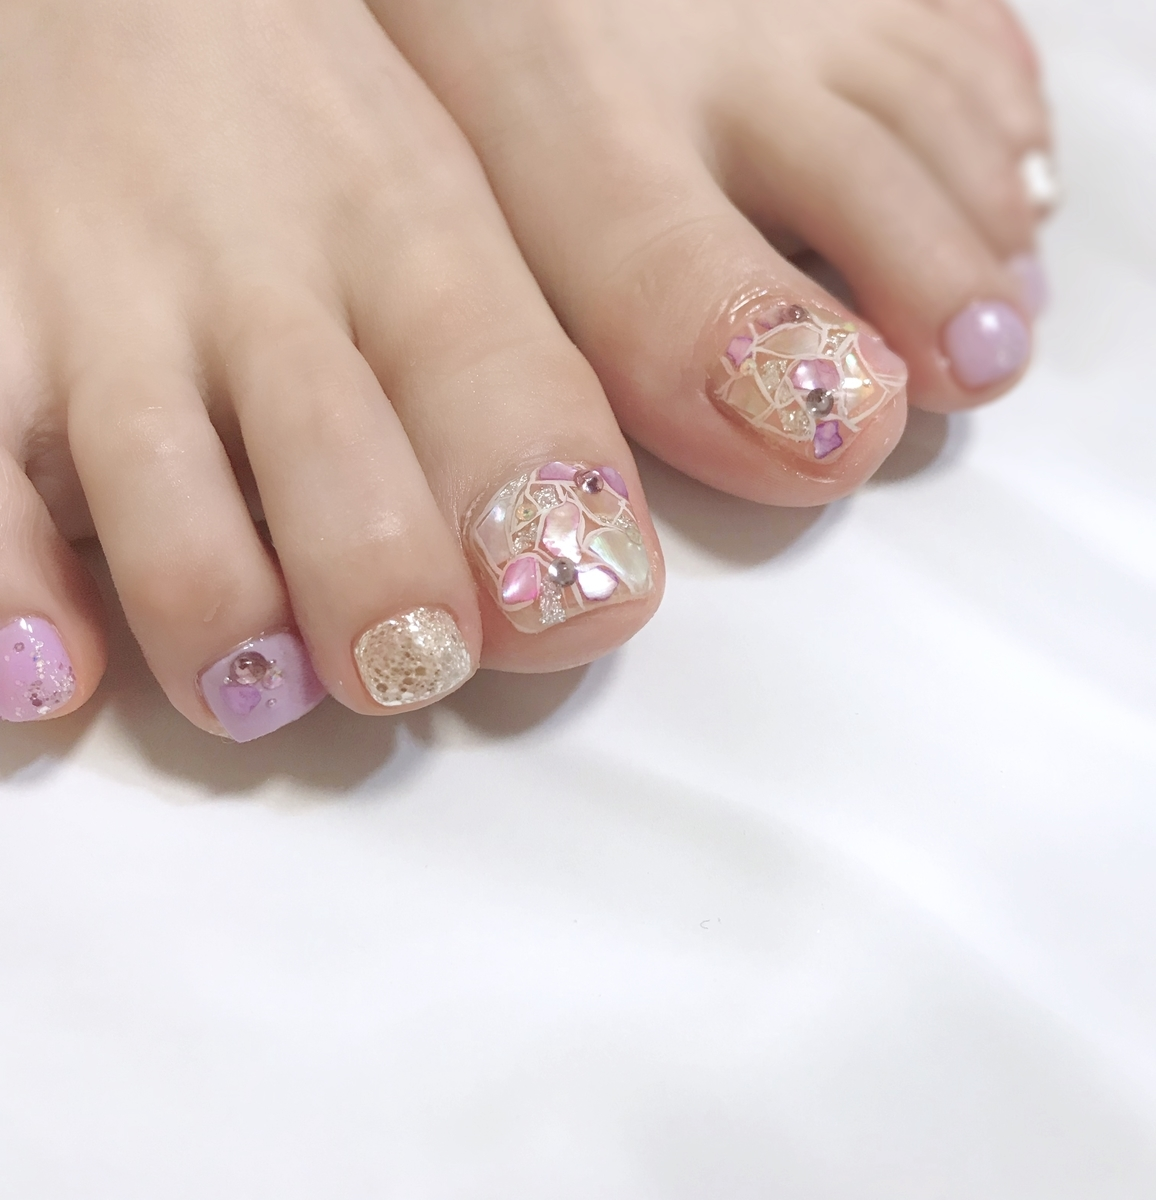 f:id:yuriyurixxx:20190523004540j:plain